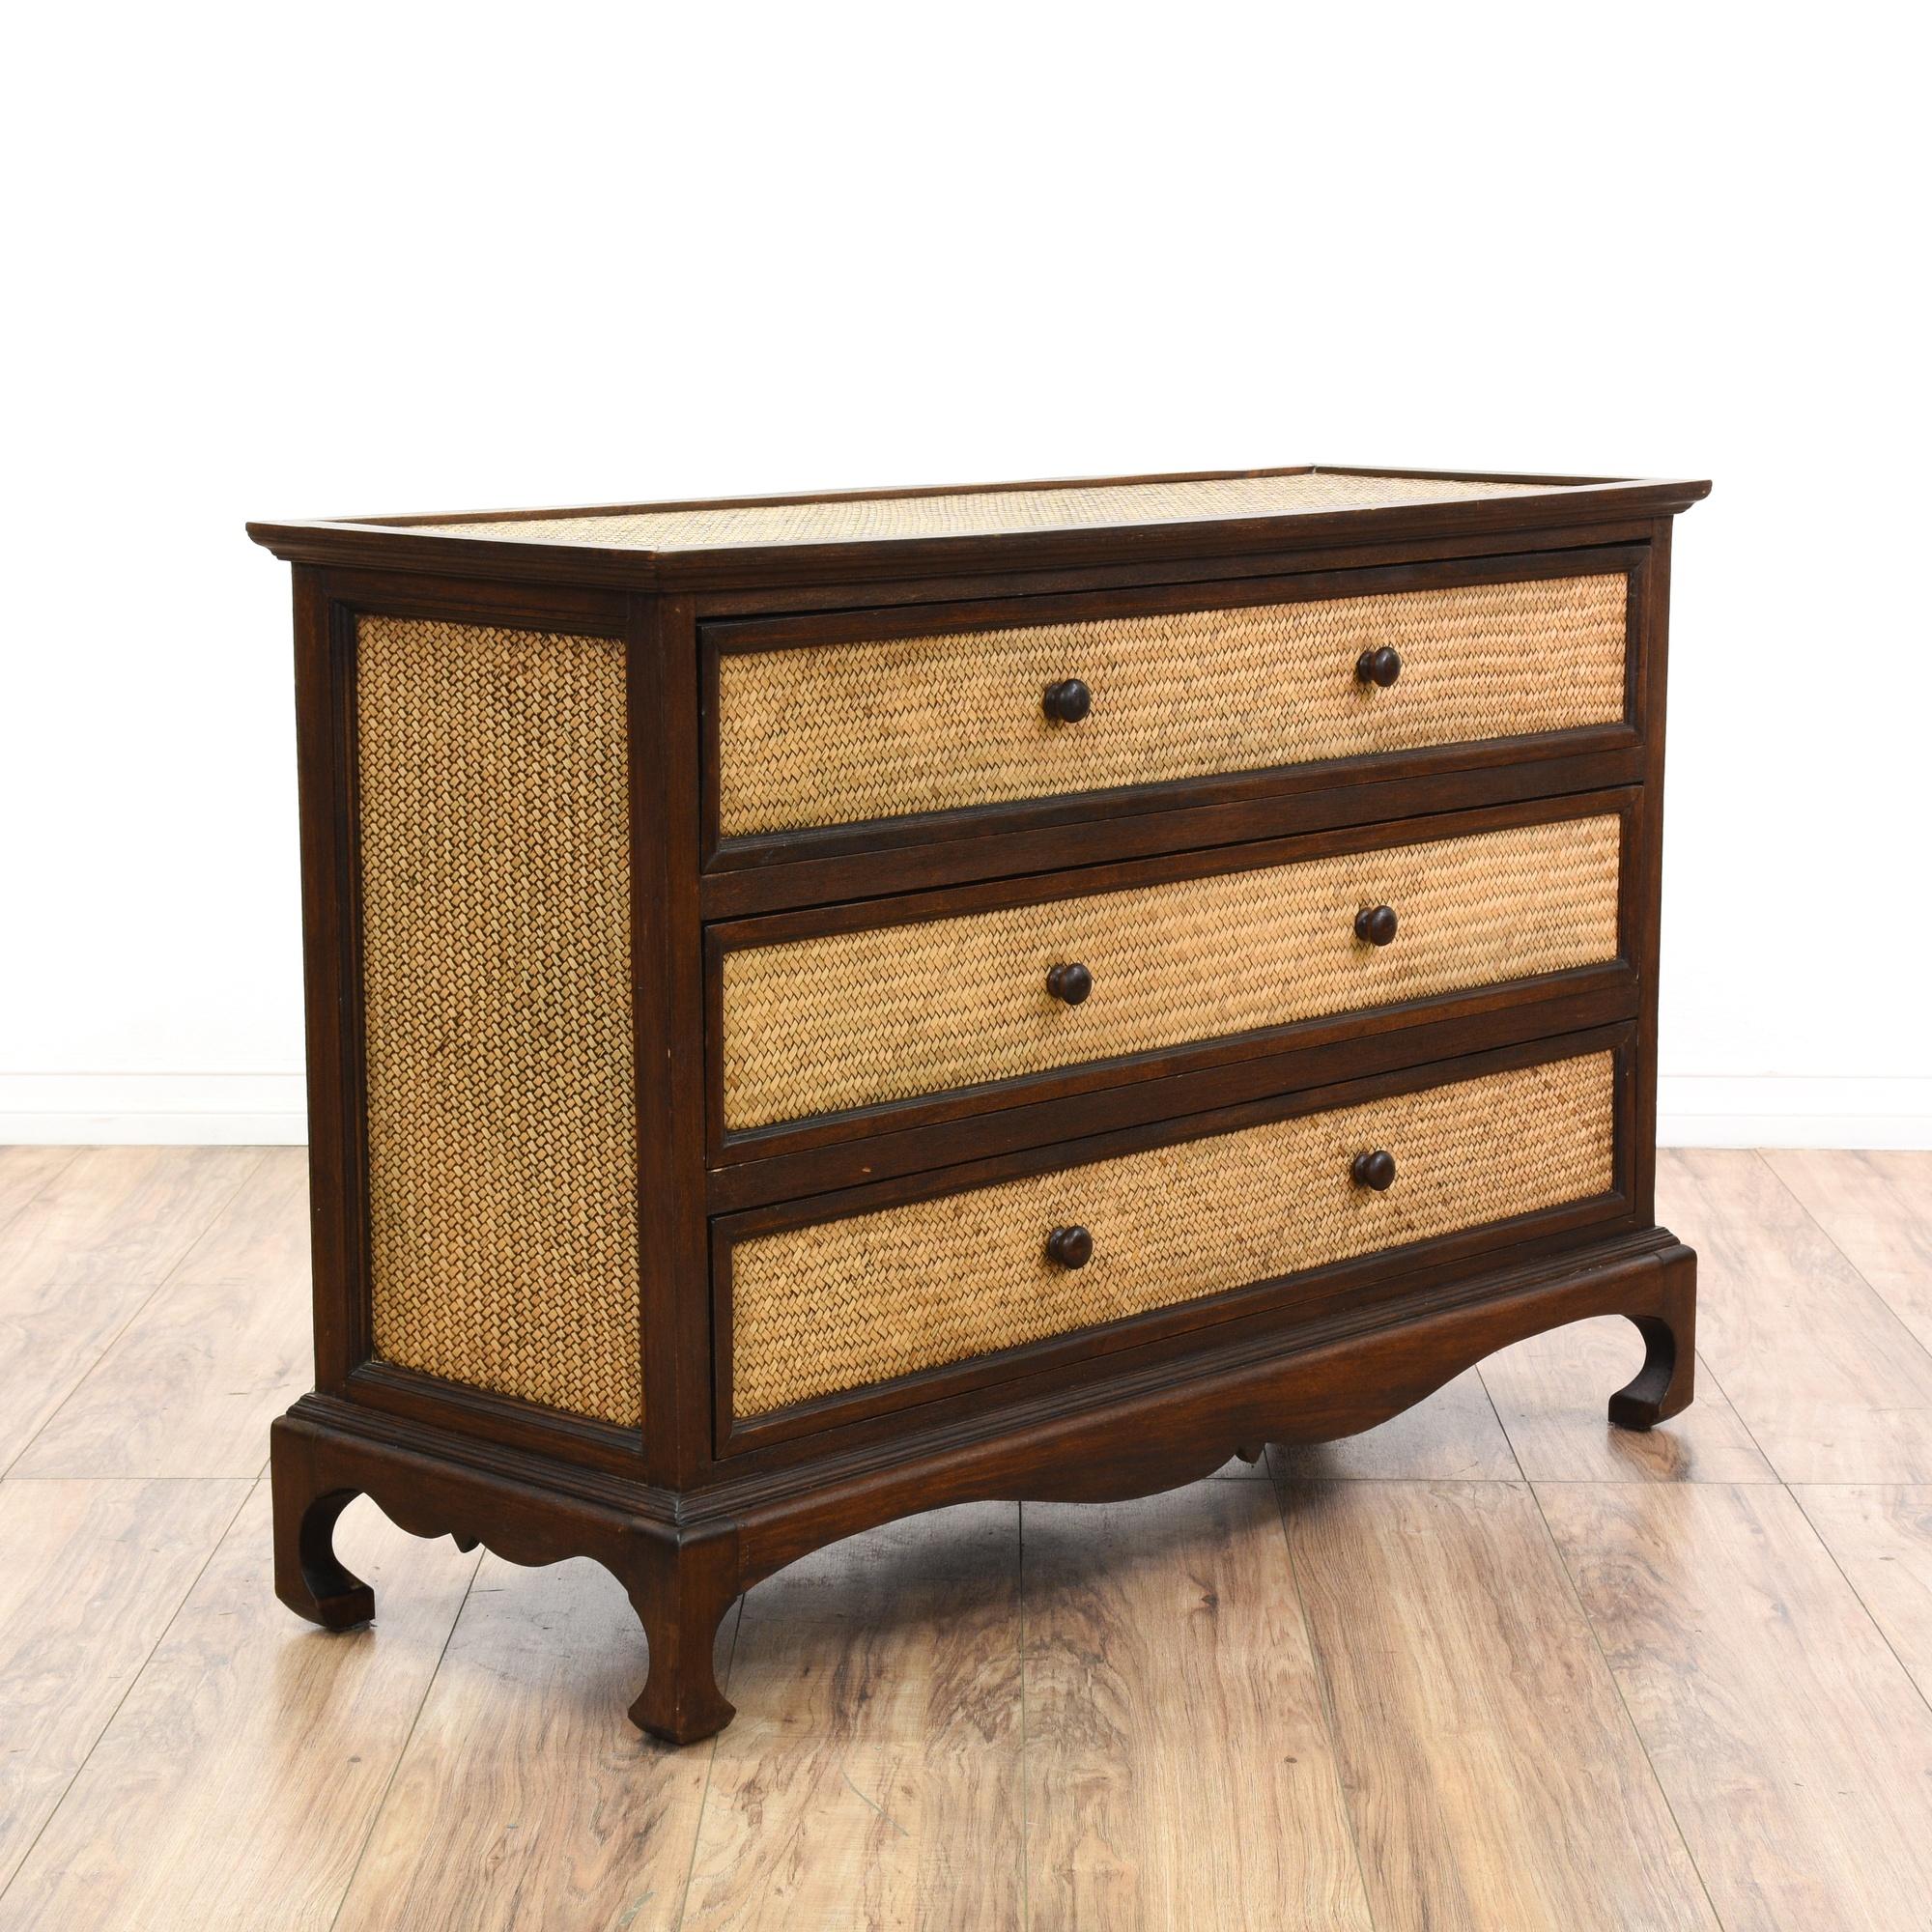 Carved Wood Rattan Chest Of Drawers Loveseat Vintage Furniture San Diego Amp Los Angeles